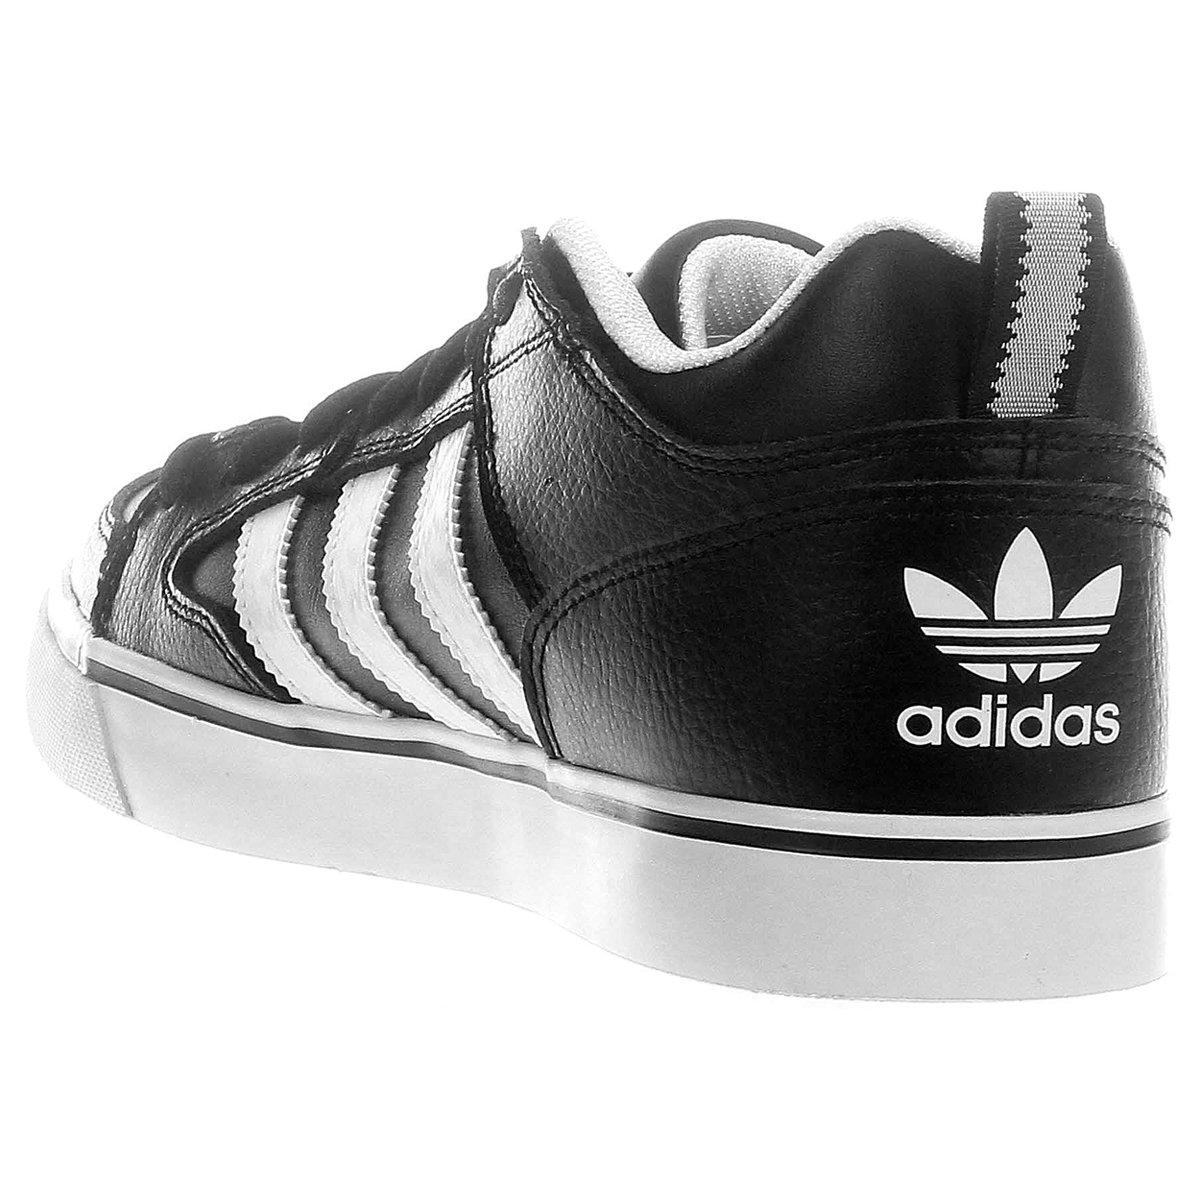 4a86592d82 Tênis Adidas Varial Low II - Compre Agora